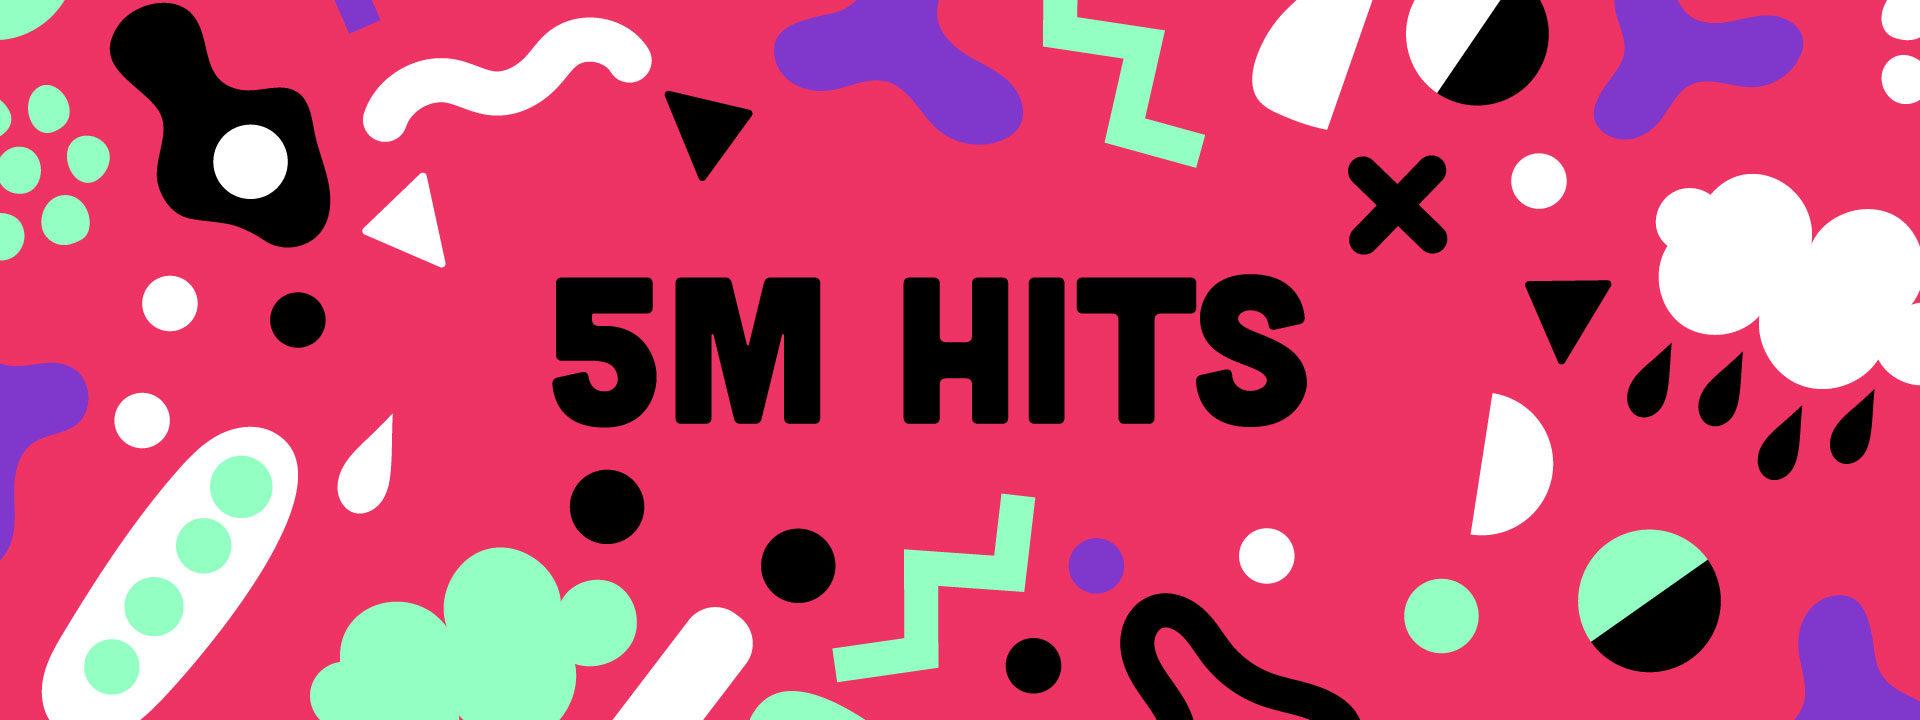 5 million hits!